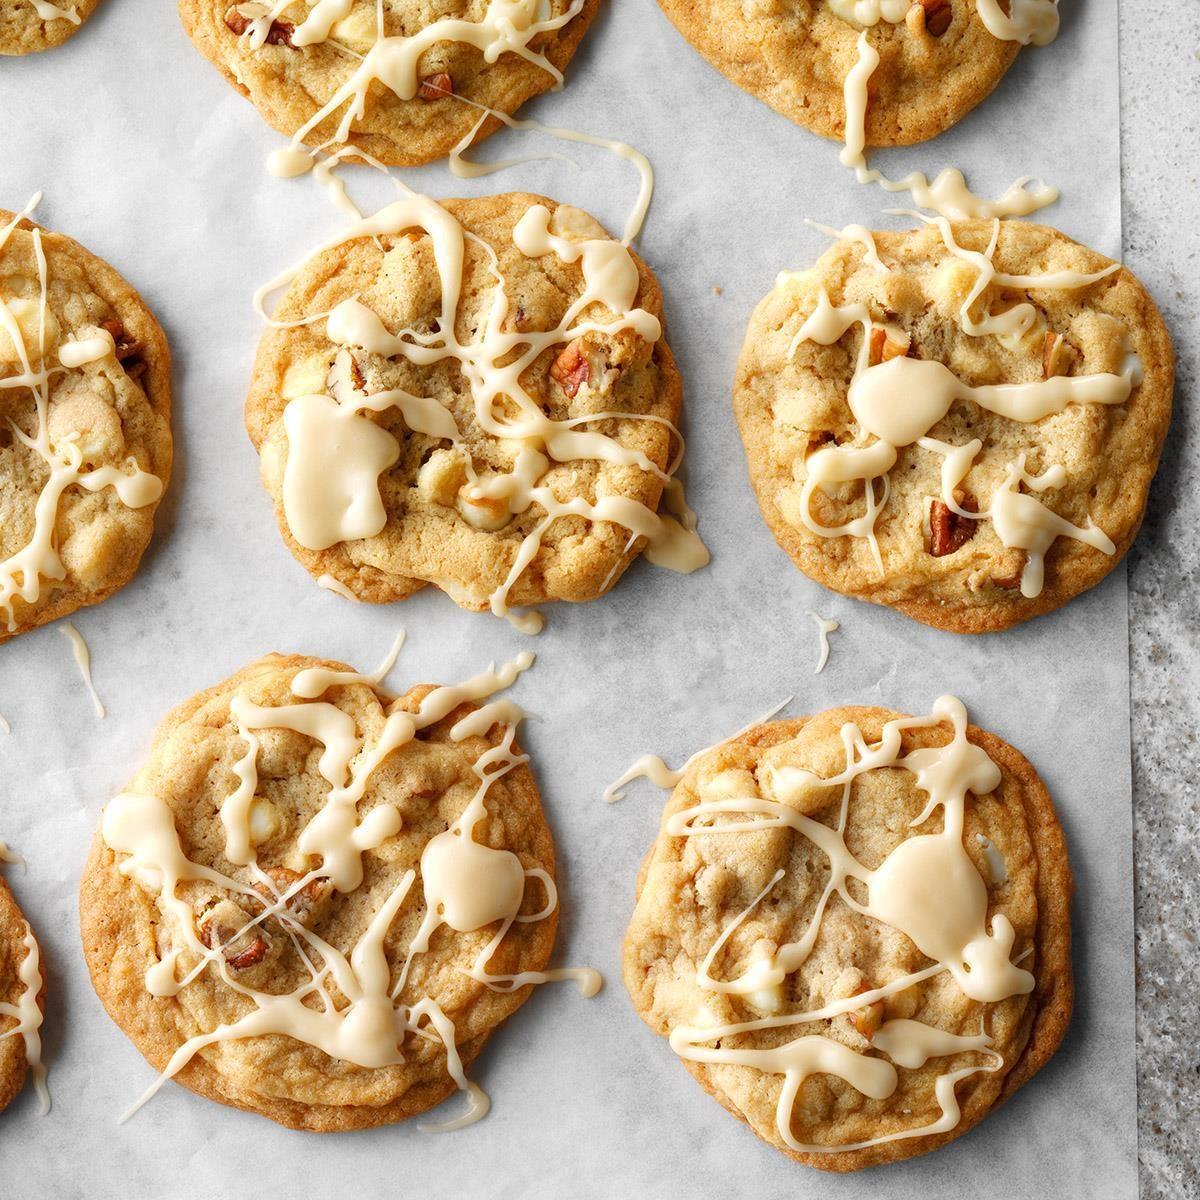 80 church bake sale recipes